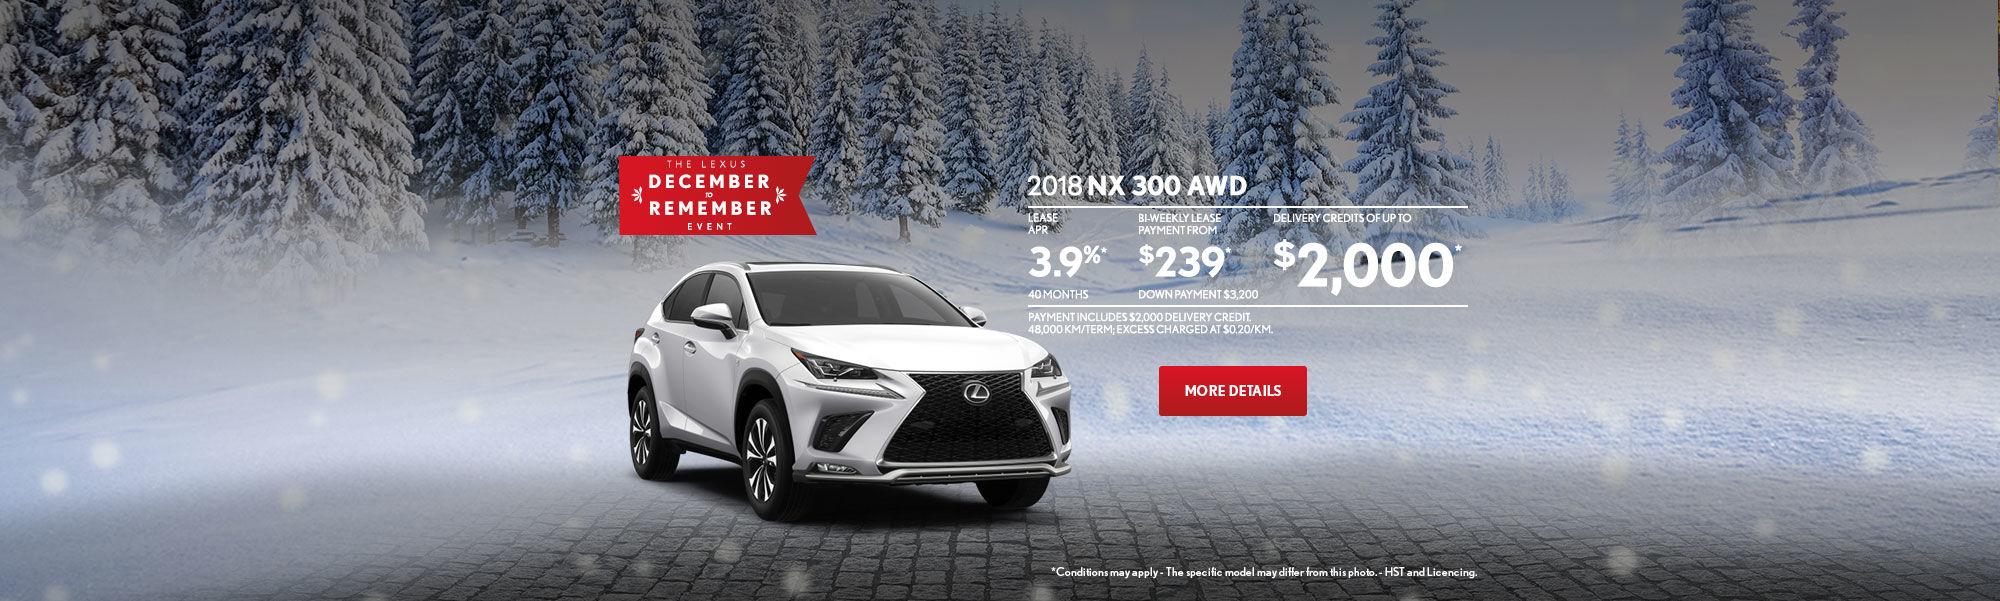 Lexus NX December